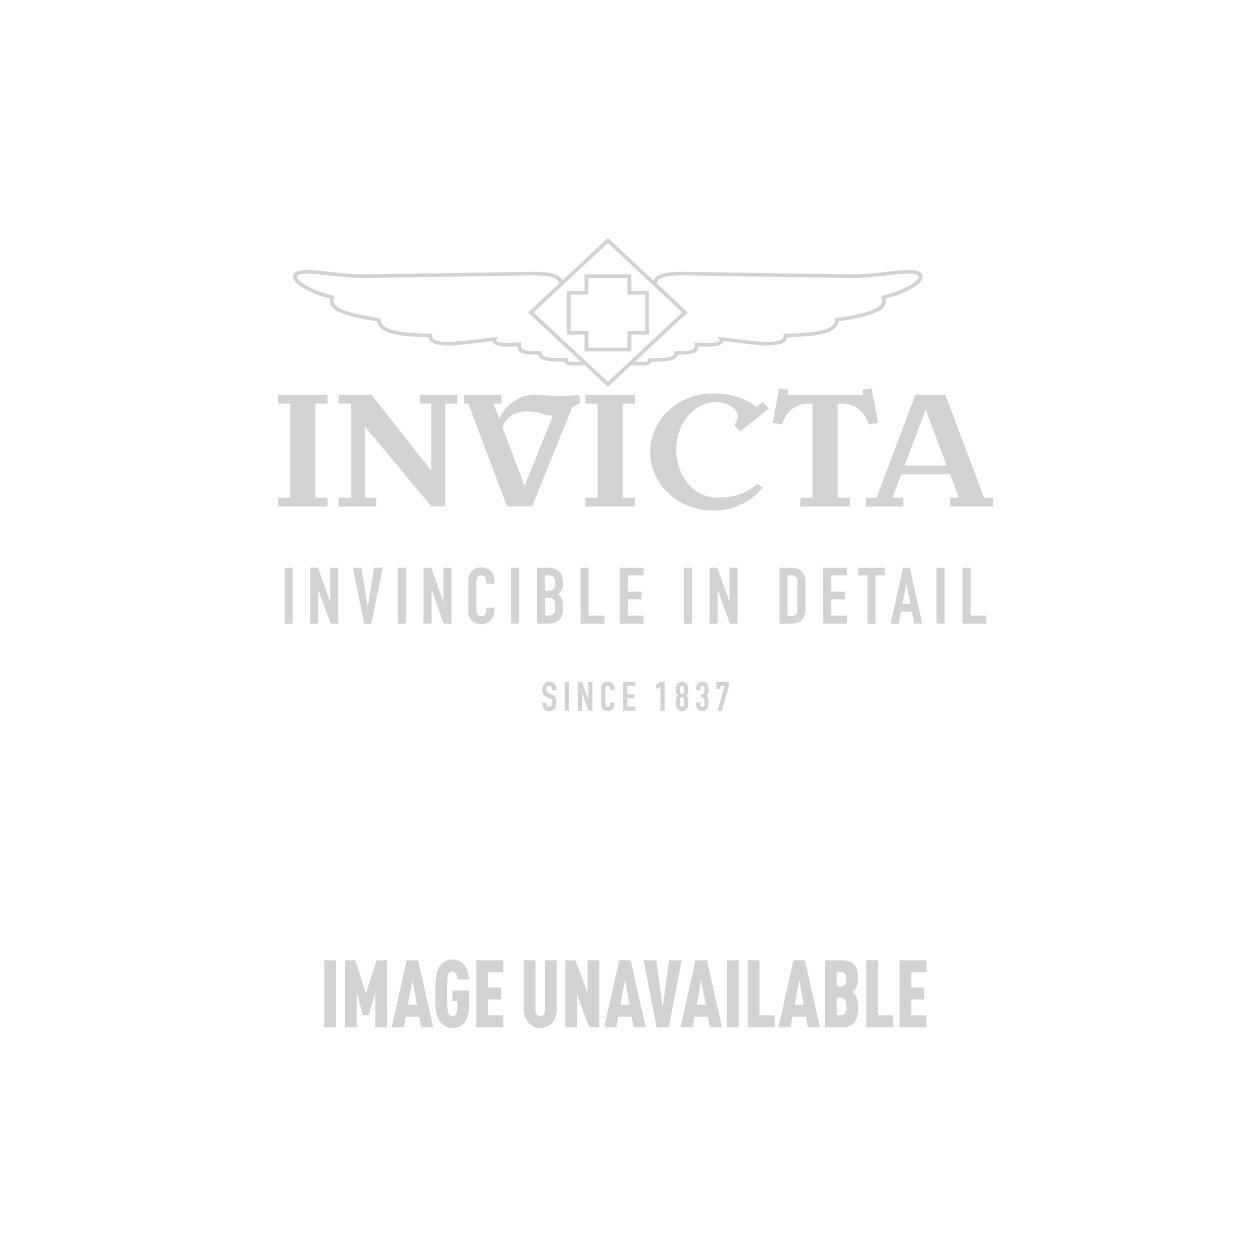 INVICTA Jewelry LUXANA Earrings None 11.5 Silver 925 Rhodium - Model J0184